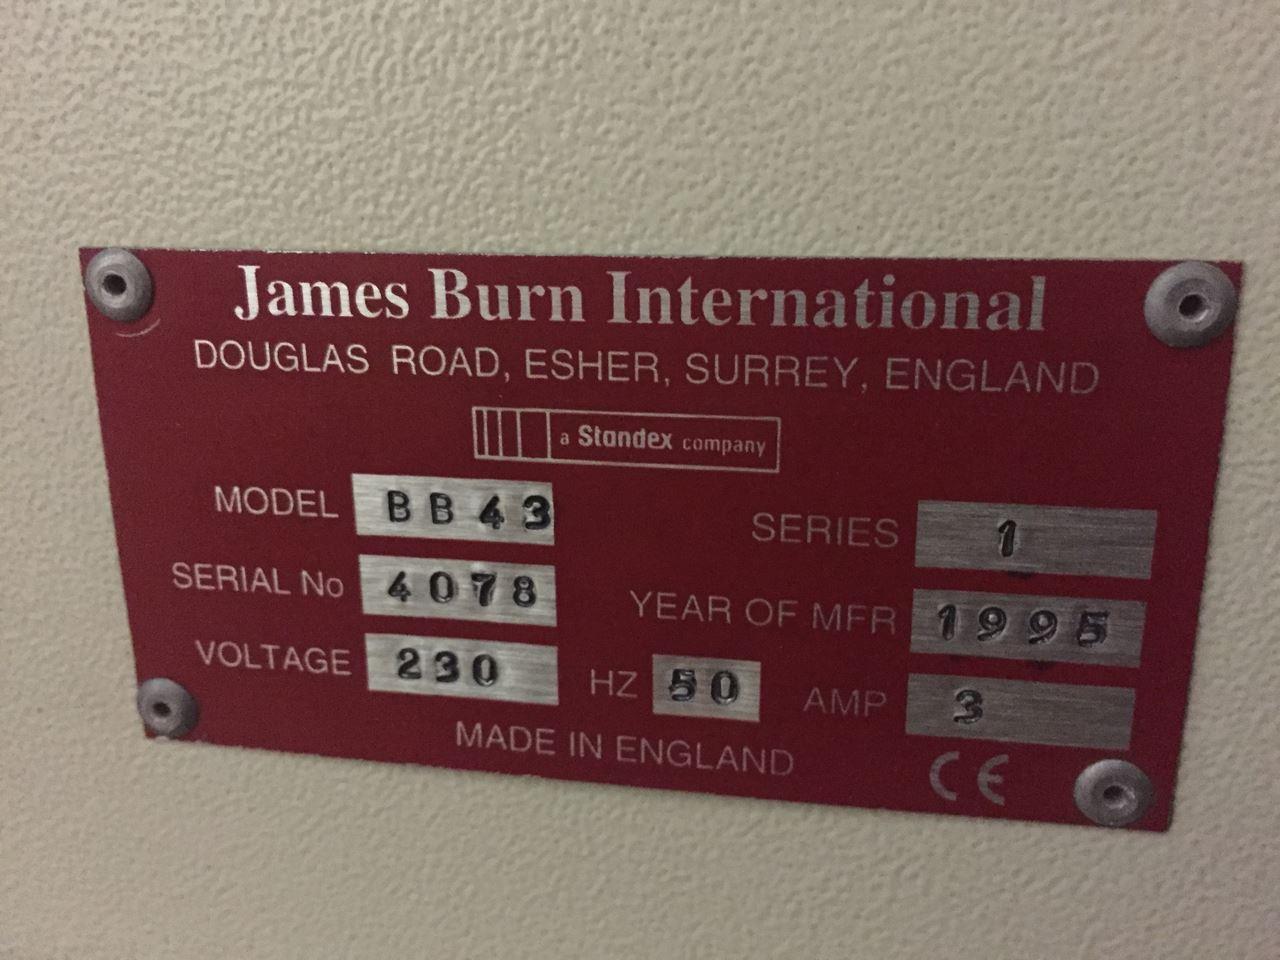 JAMES-BURN-INTERNATIONAL WIRE O, Rocznik : 1995, ref.66197 | www.coci-sa.com/pl | 66197n_5.jpg